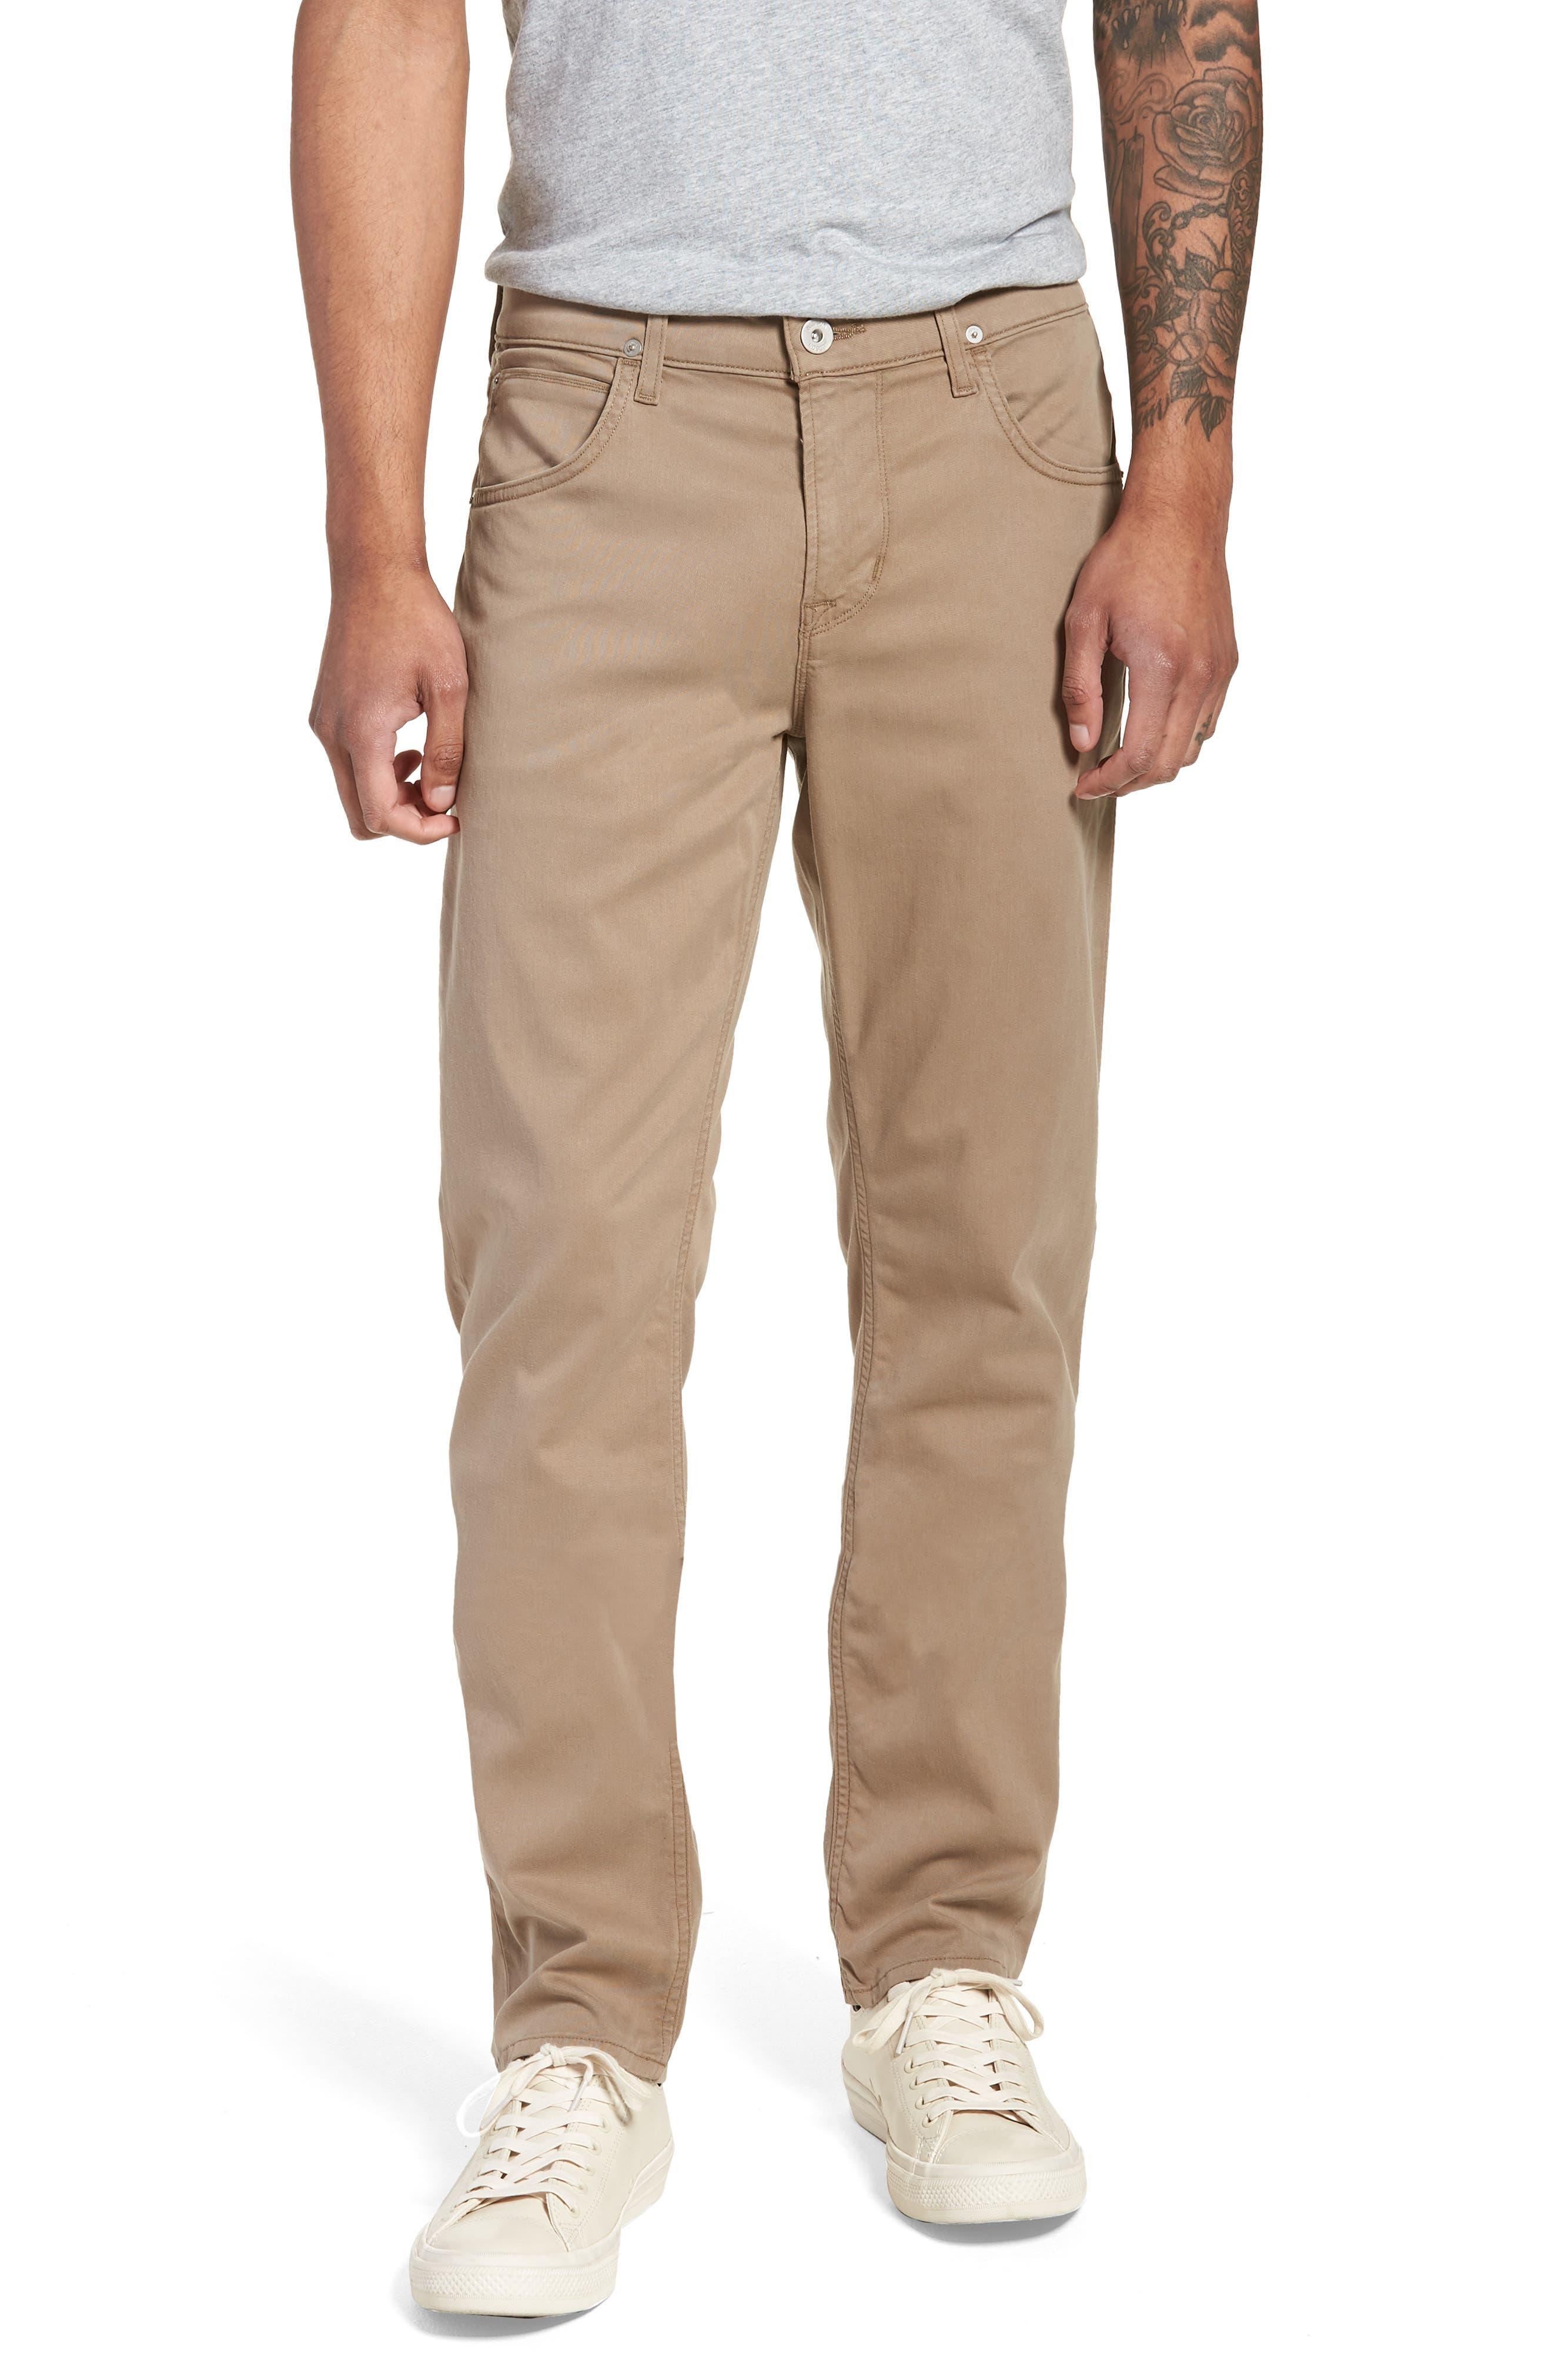 Blake Slim Fit Jeans,                             Main thumbnail 1, color,                             Sandman